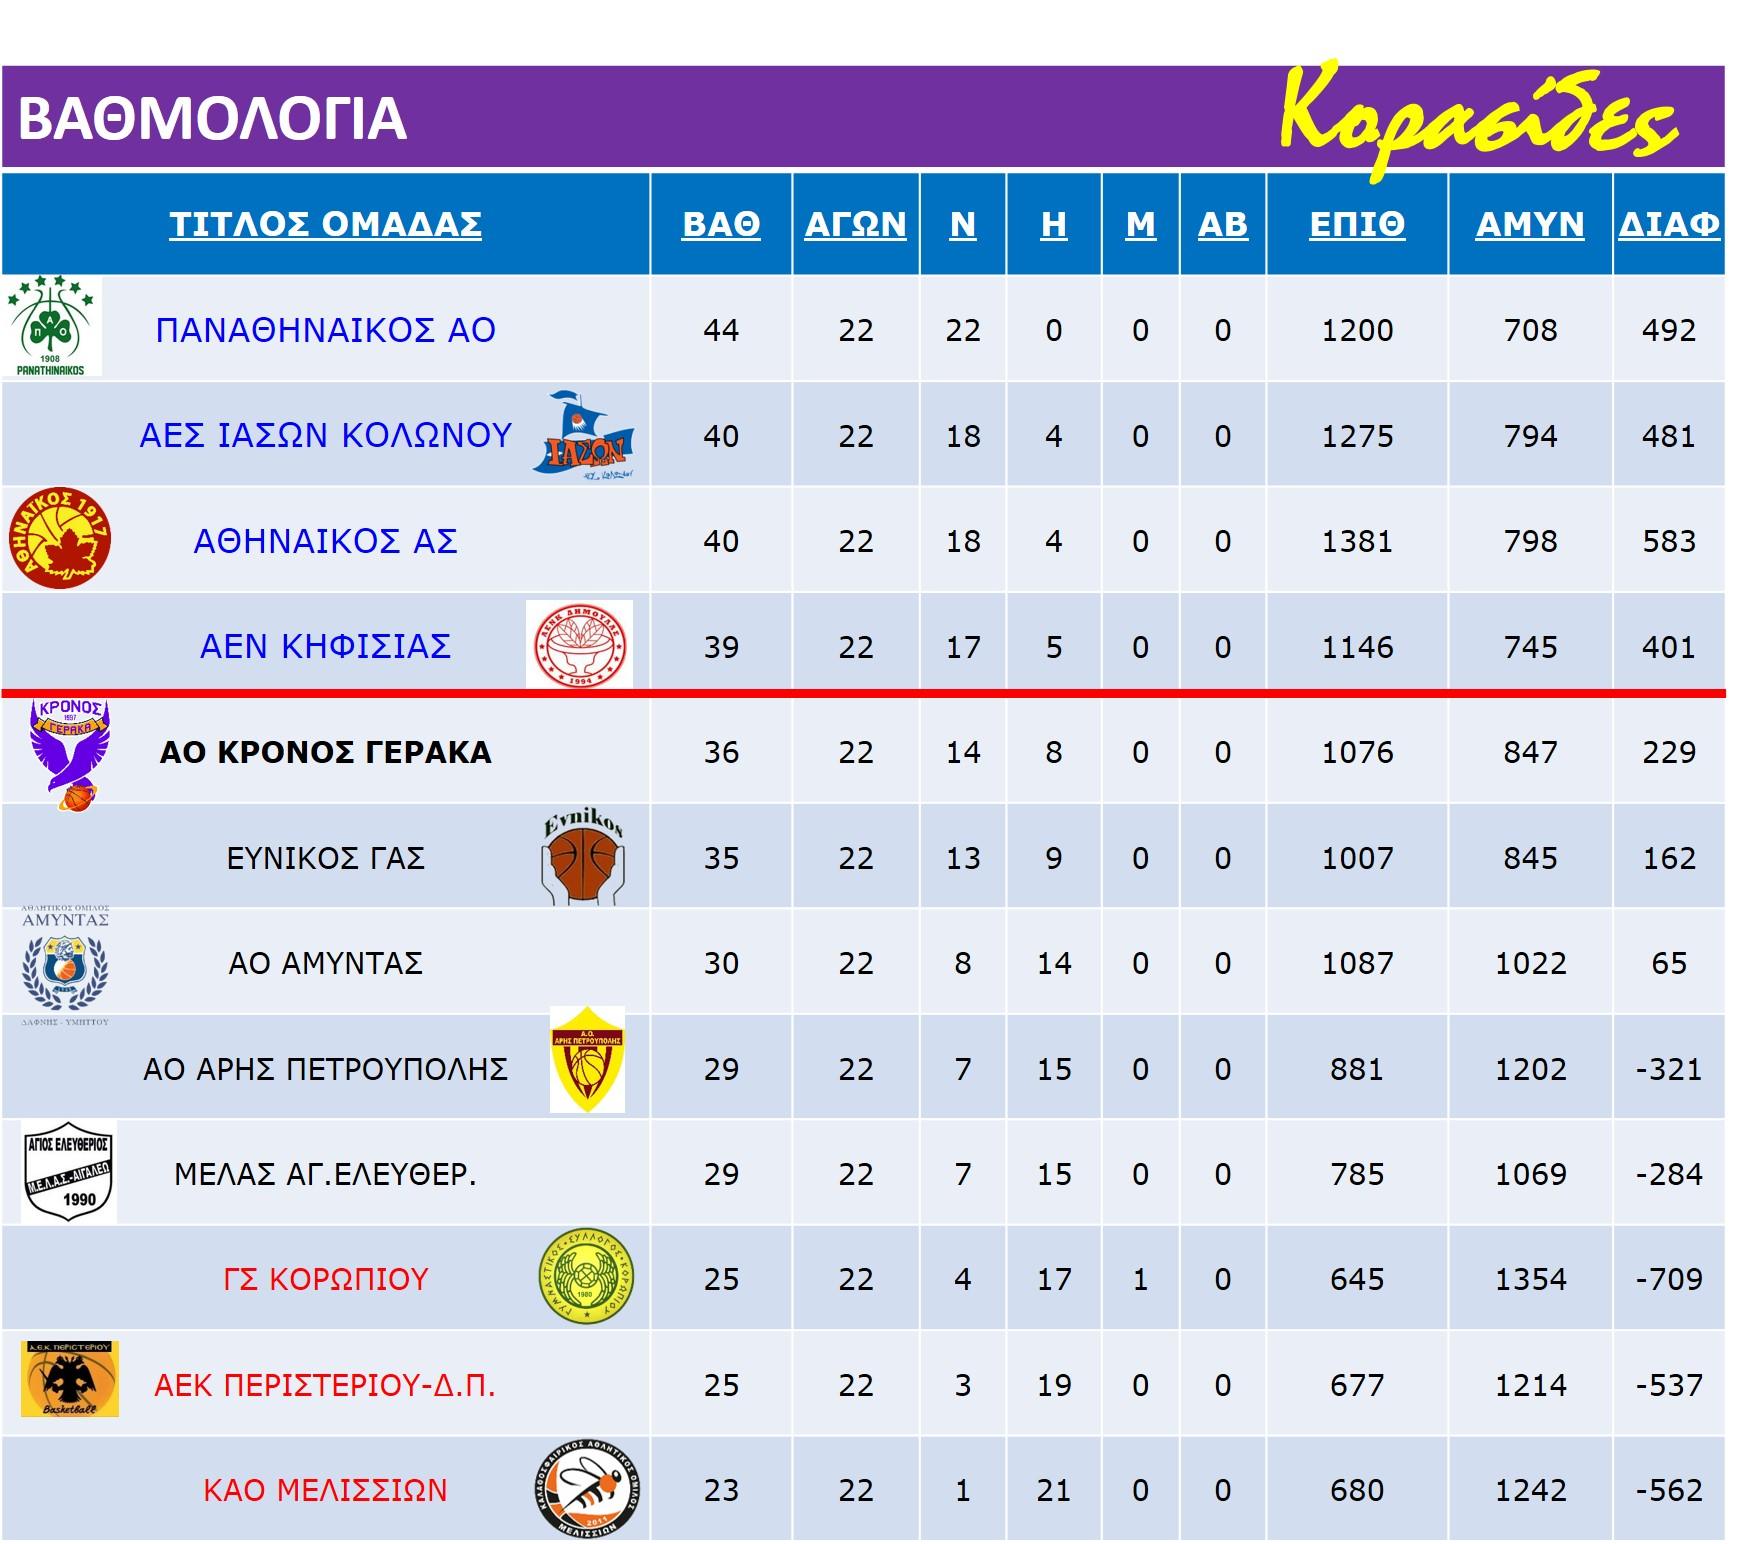 Korasides_Match_Rank-Table_22